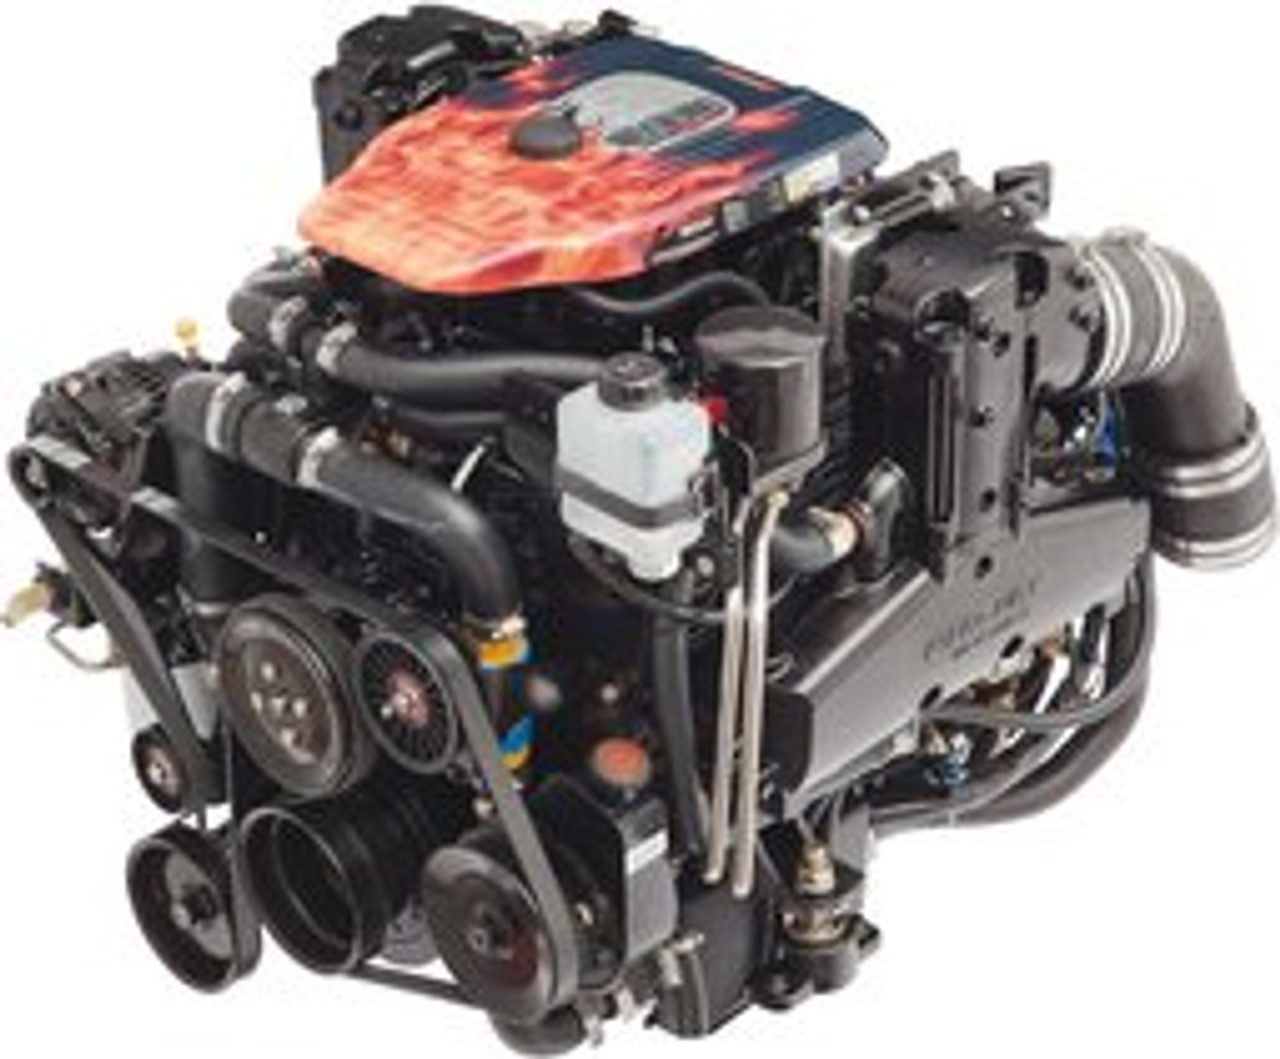 small resolution of mercruiser plus series 383 mag stroker mpi bravo engine 350 hp 714 865108r80